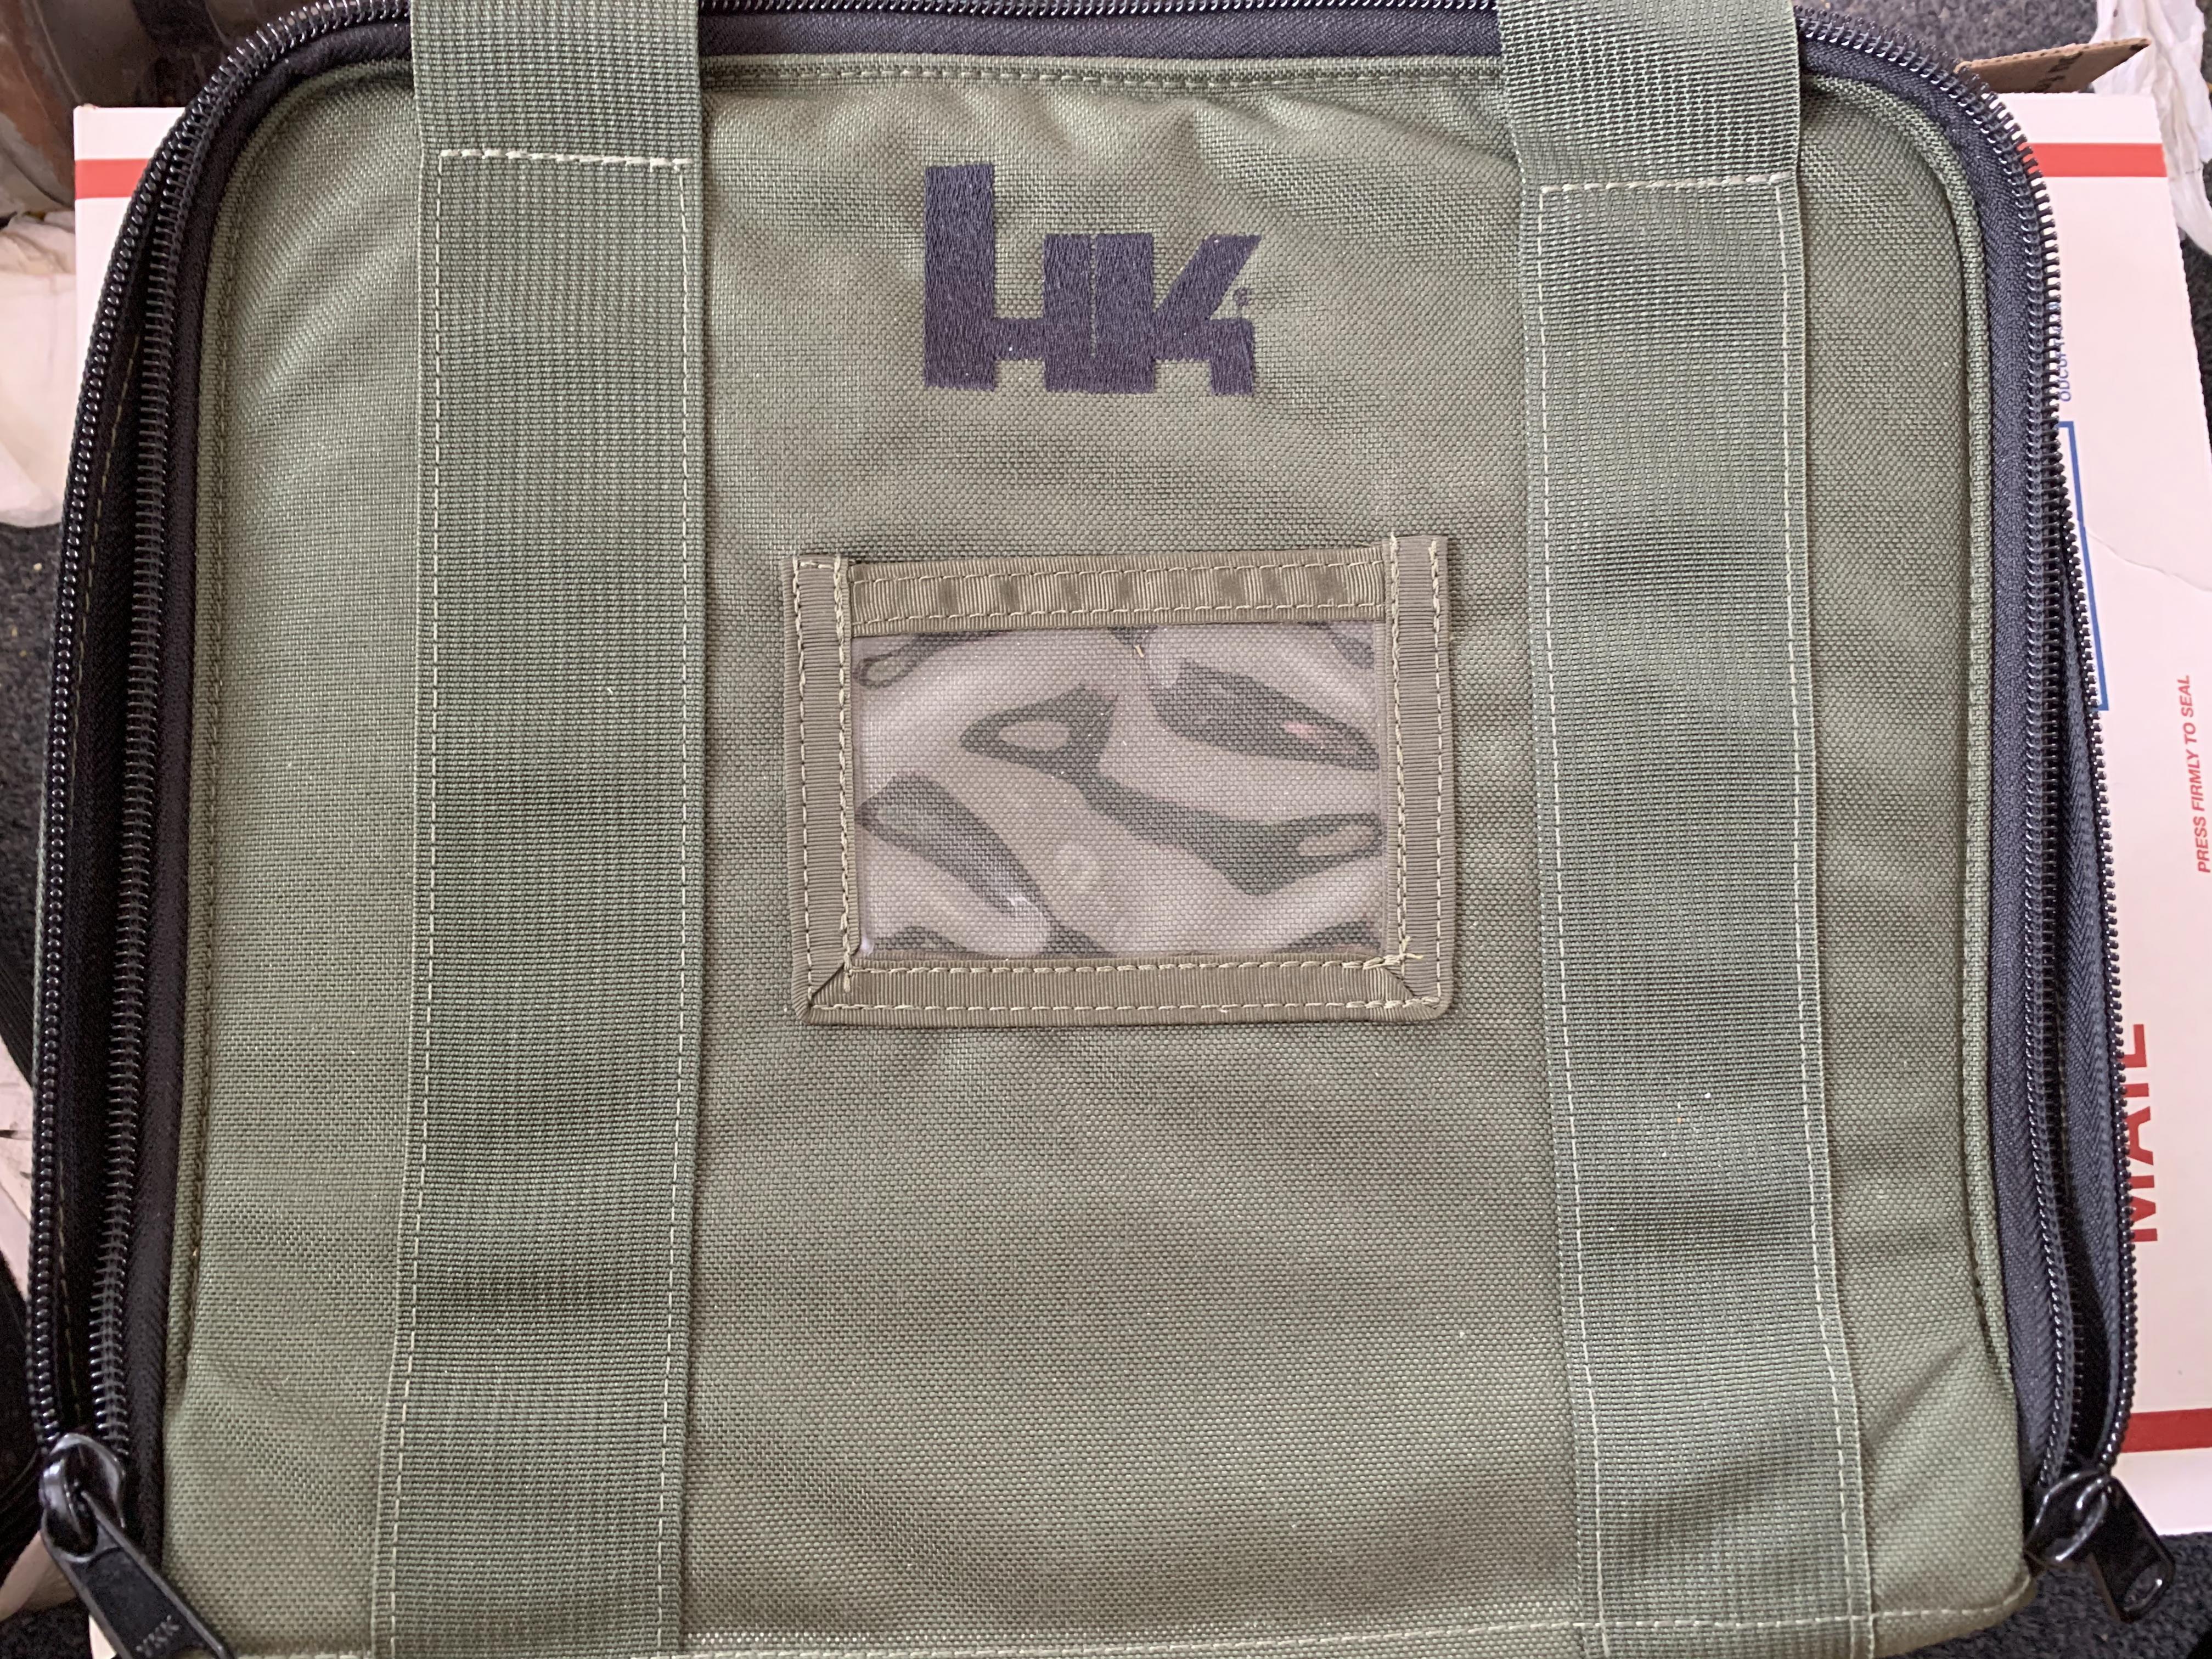 WTS: HK TACTICAL PISTOL BAG OD Green $old shipped-image1-4.jpg